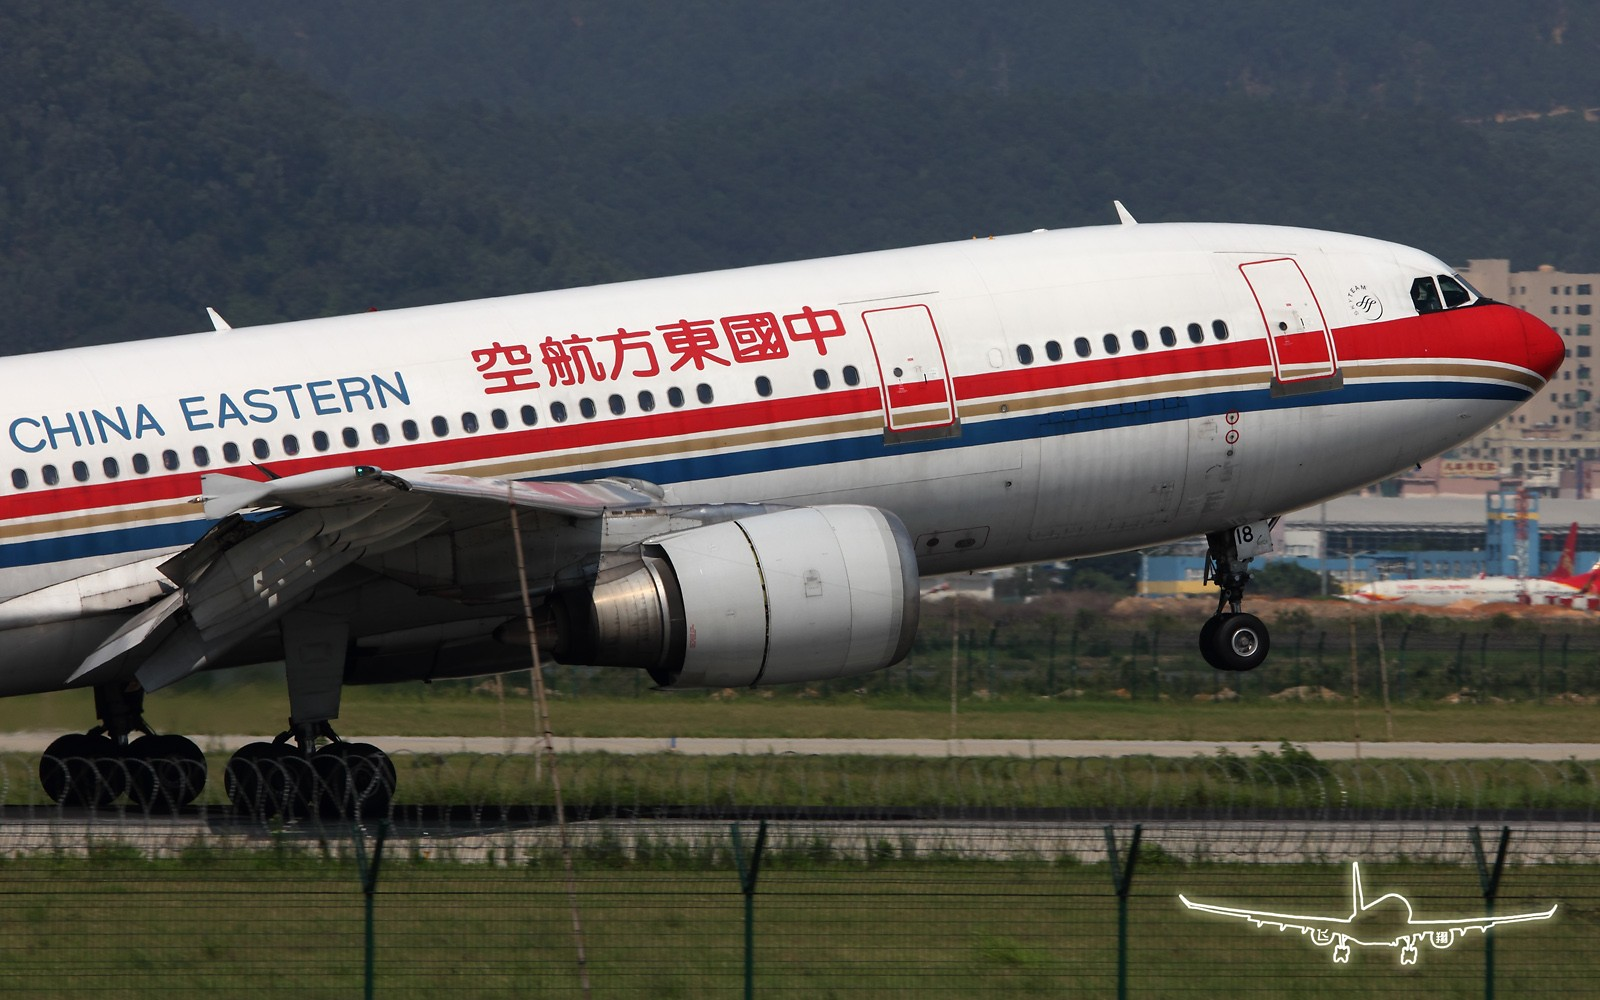 Re:[原创]★ ★ ★ ★ ★  看这AB6的仰角,想玩擦尾吗? ★ ★ ★ ★ ★ AIRBUS A300-B4-600R B-2318 中国深圳宝安机场